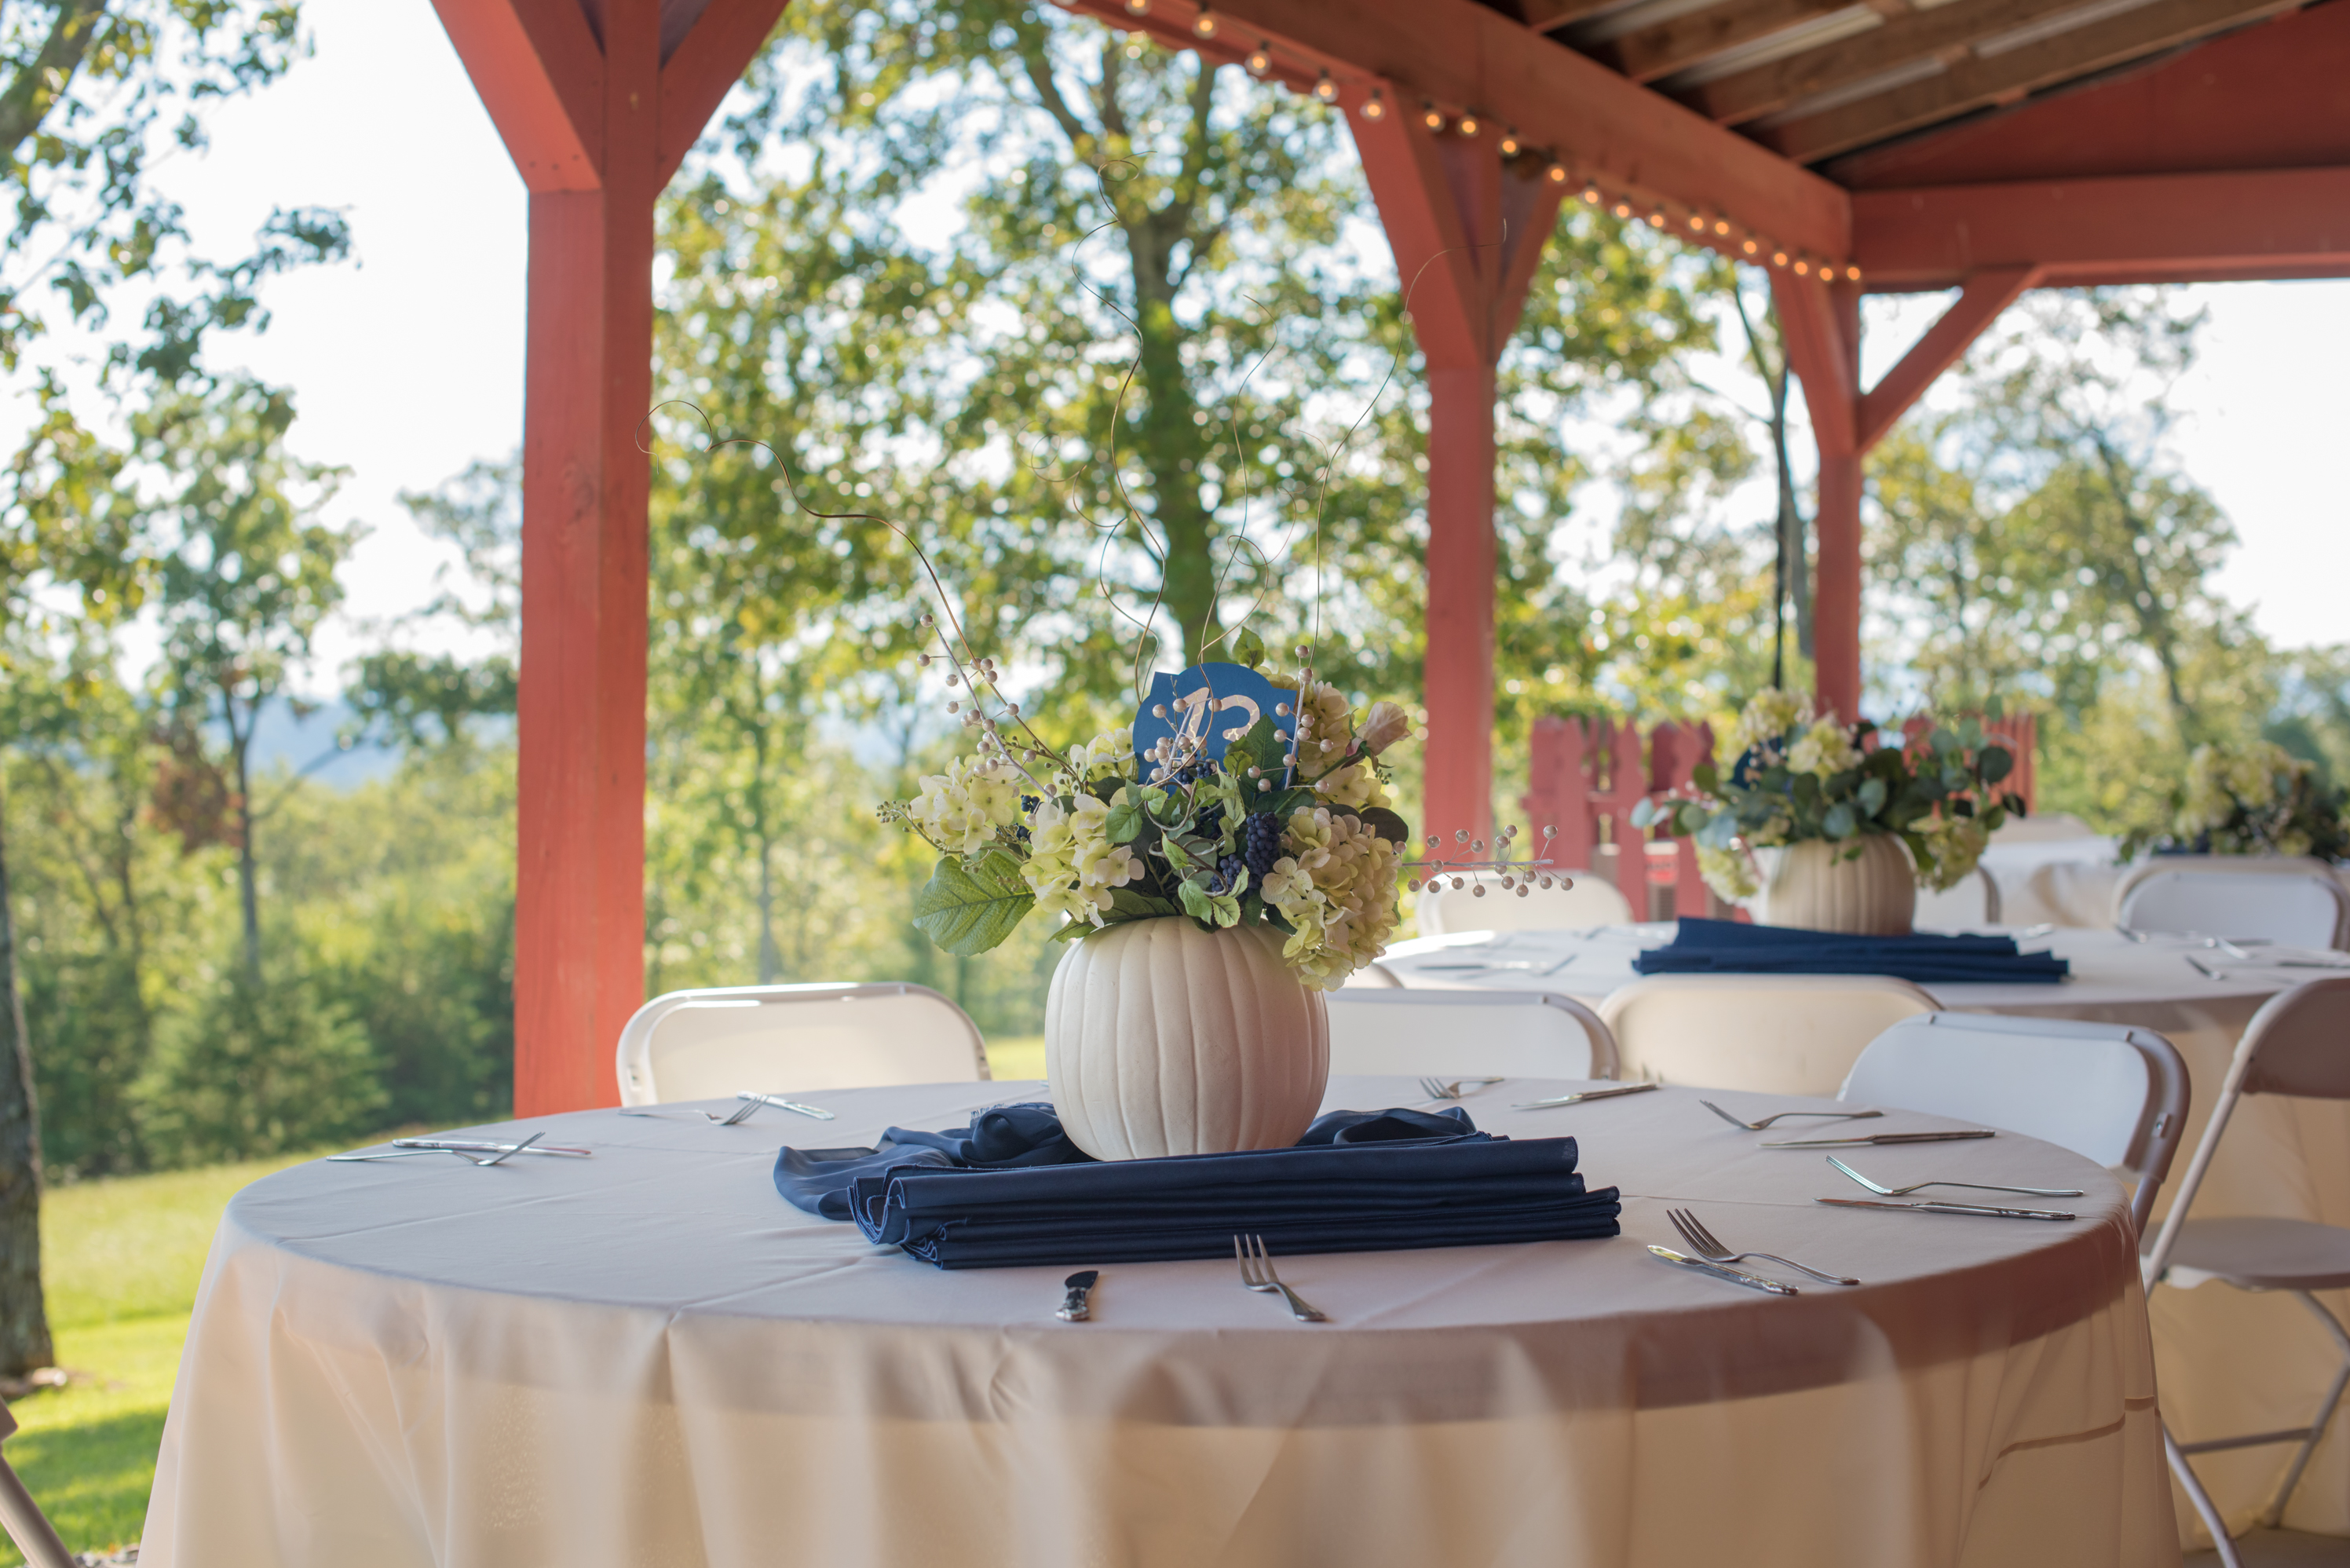 5 Reasons To Love This North Georgia Barn Wedding Venue